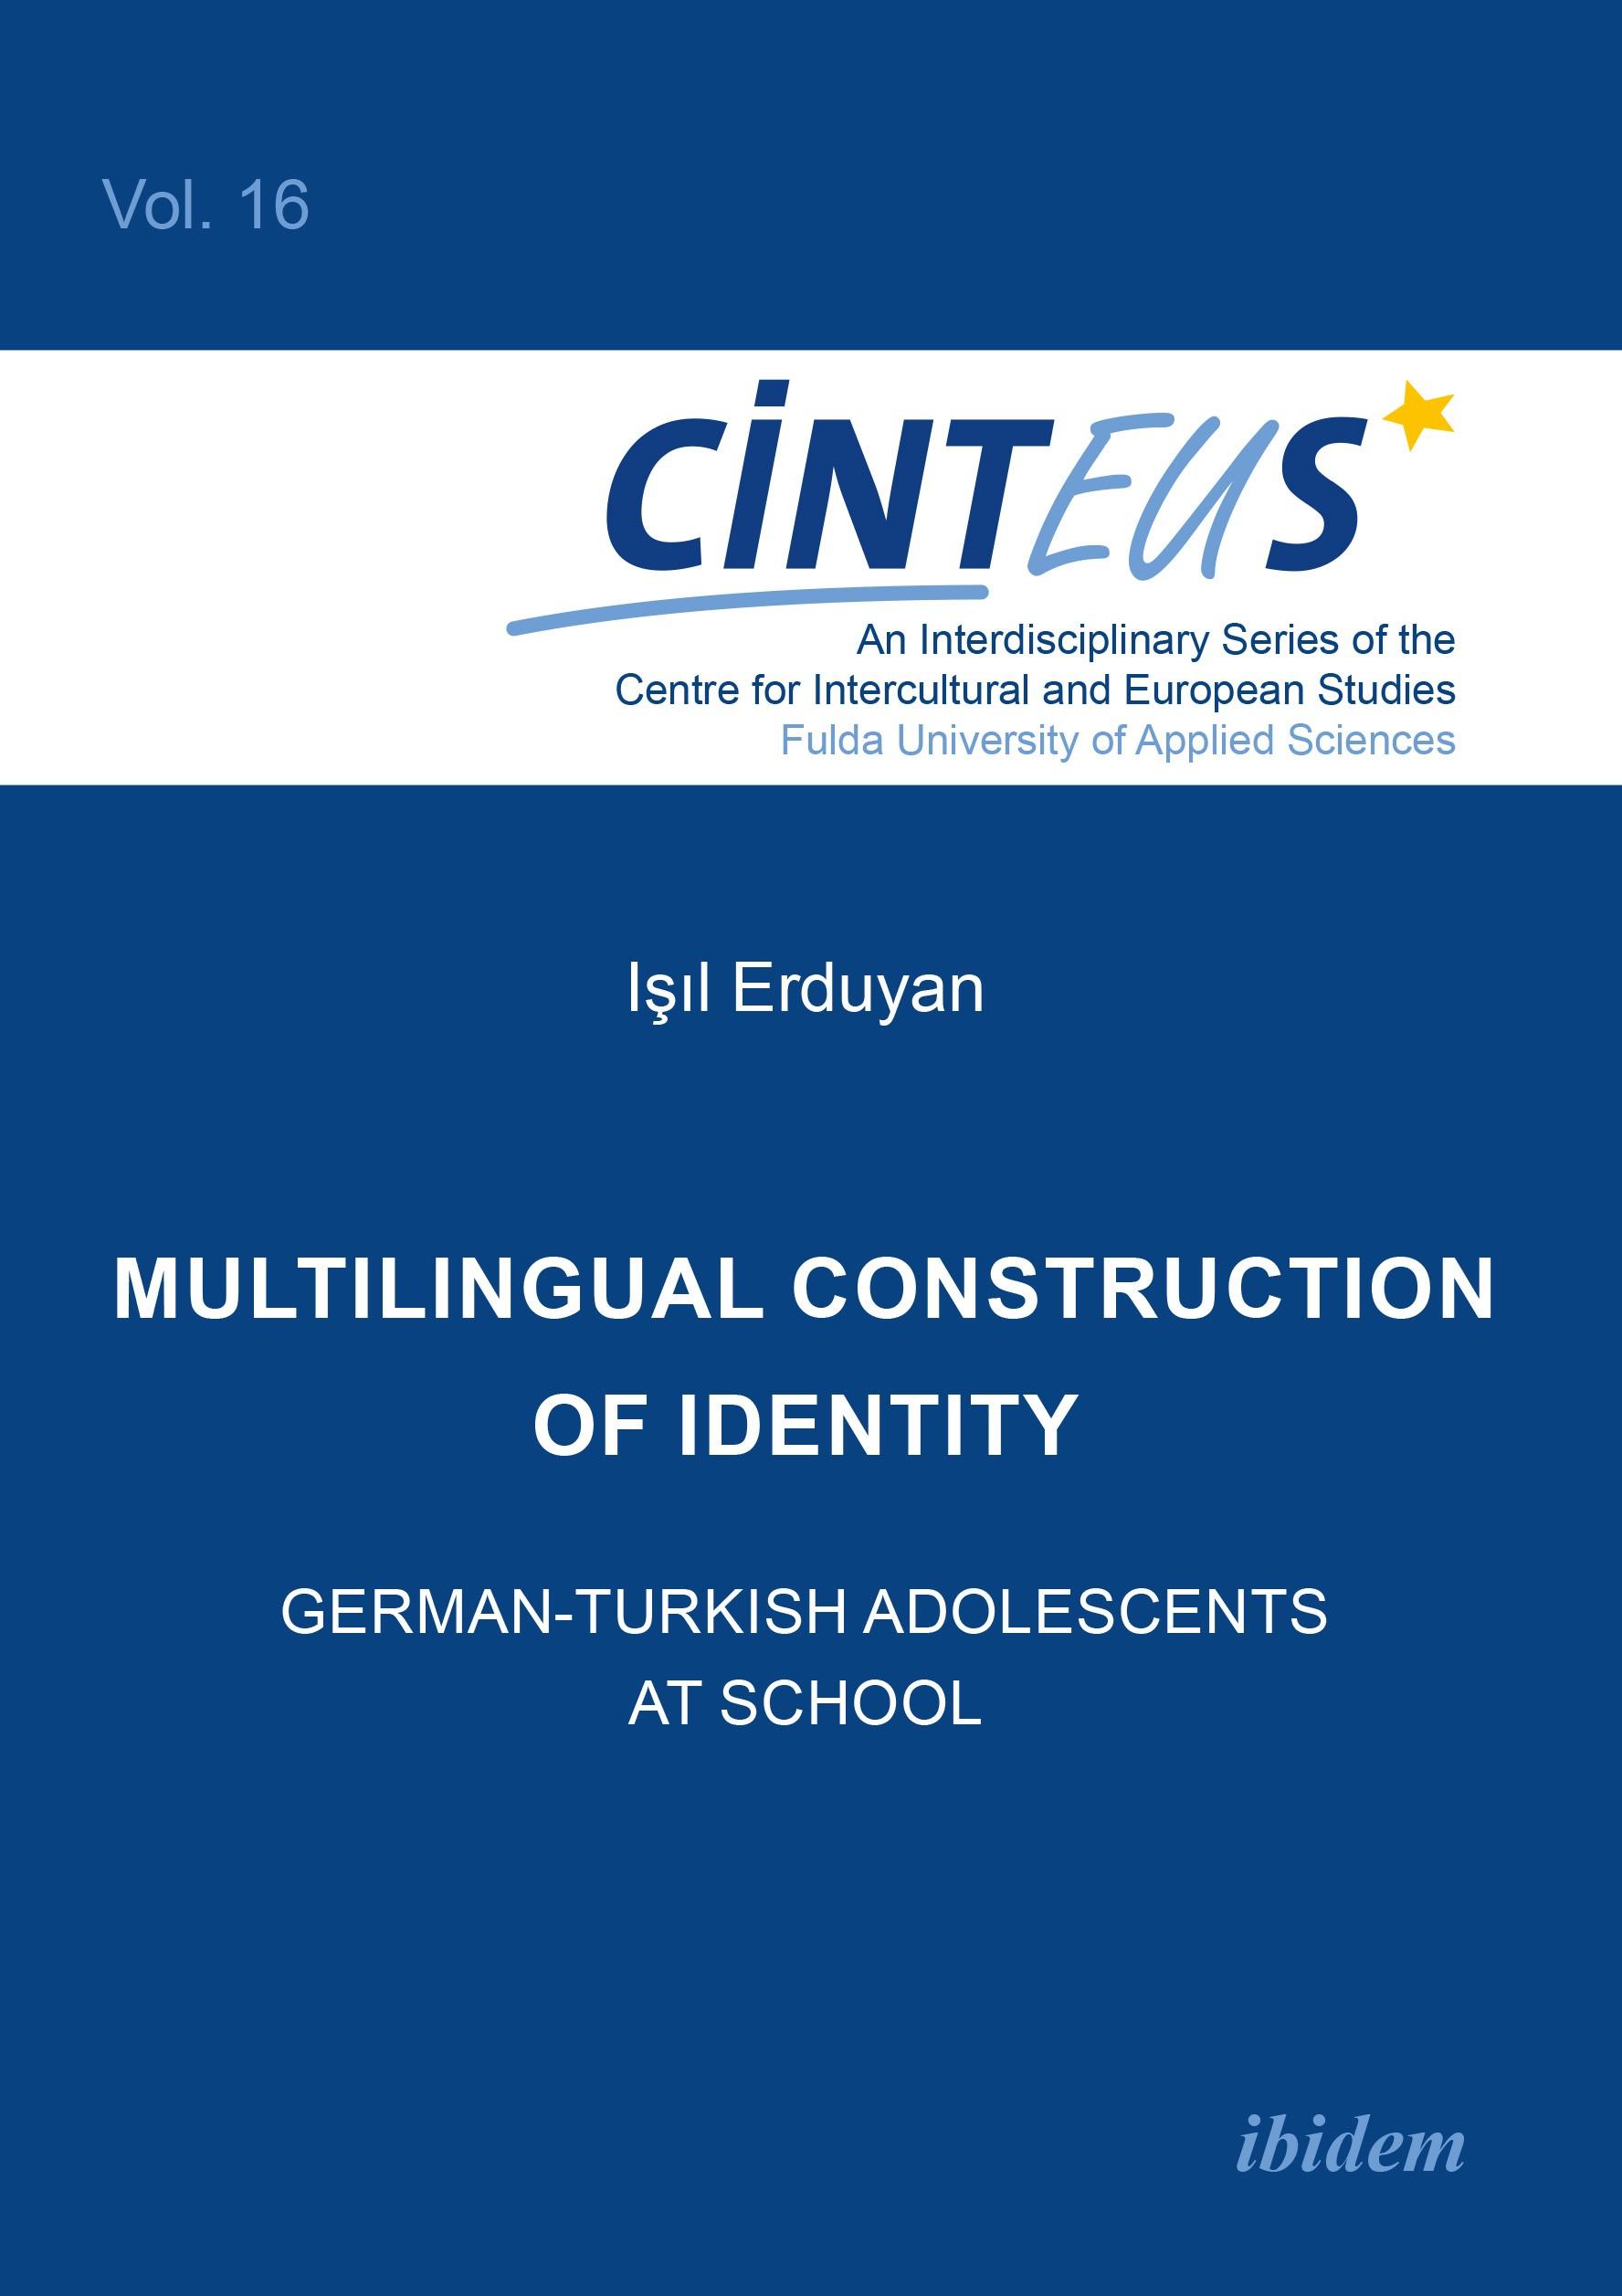 Multilingual Construction of Identity